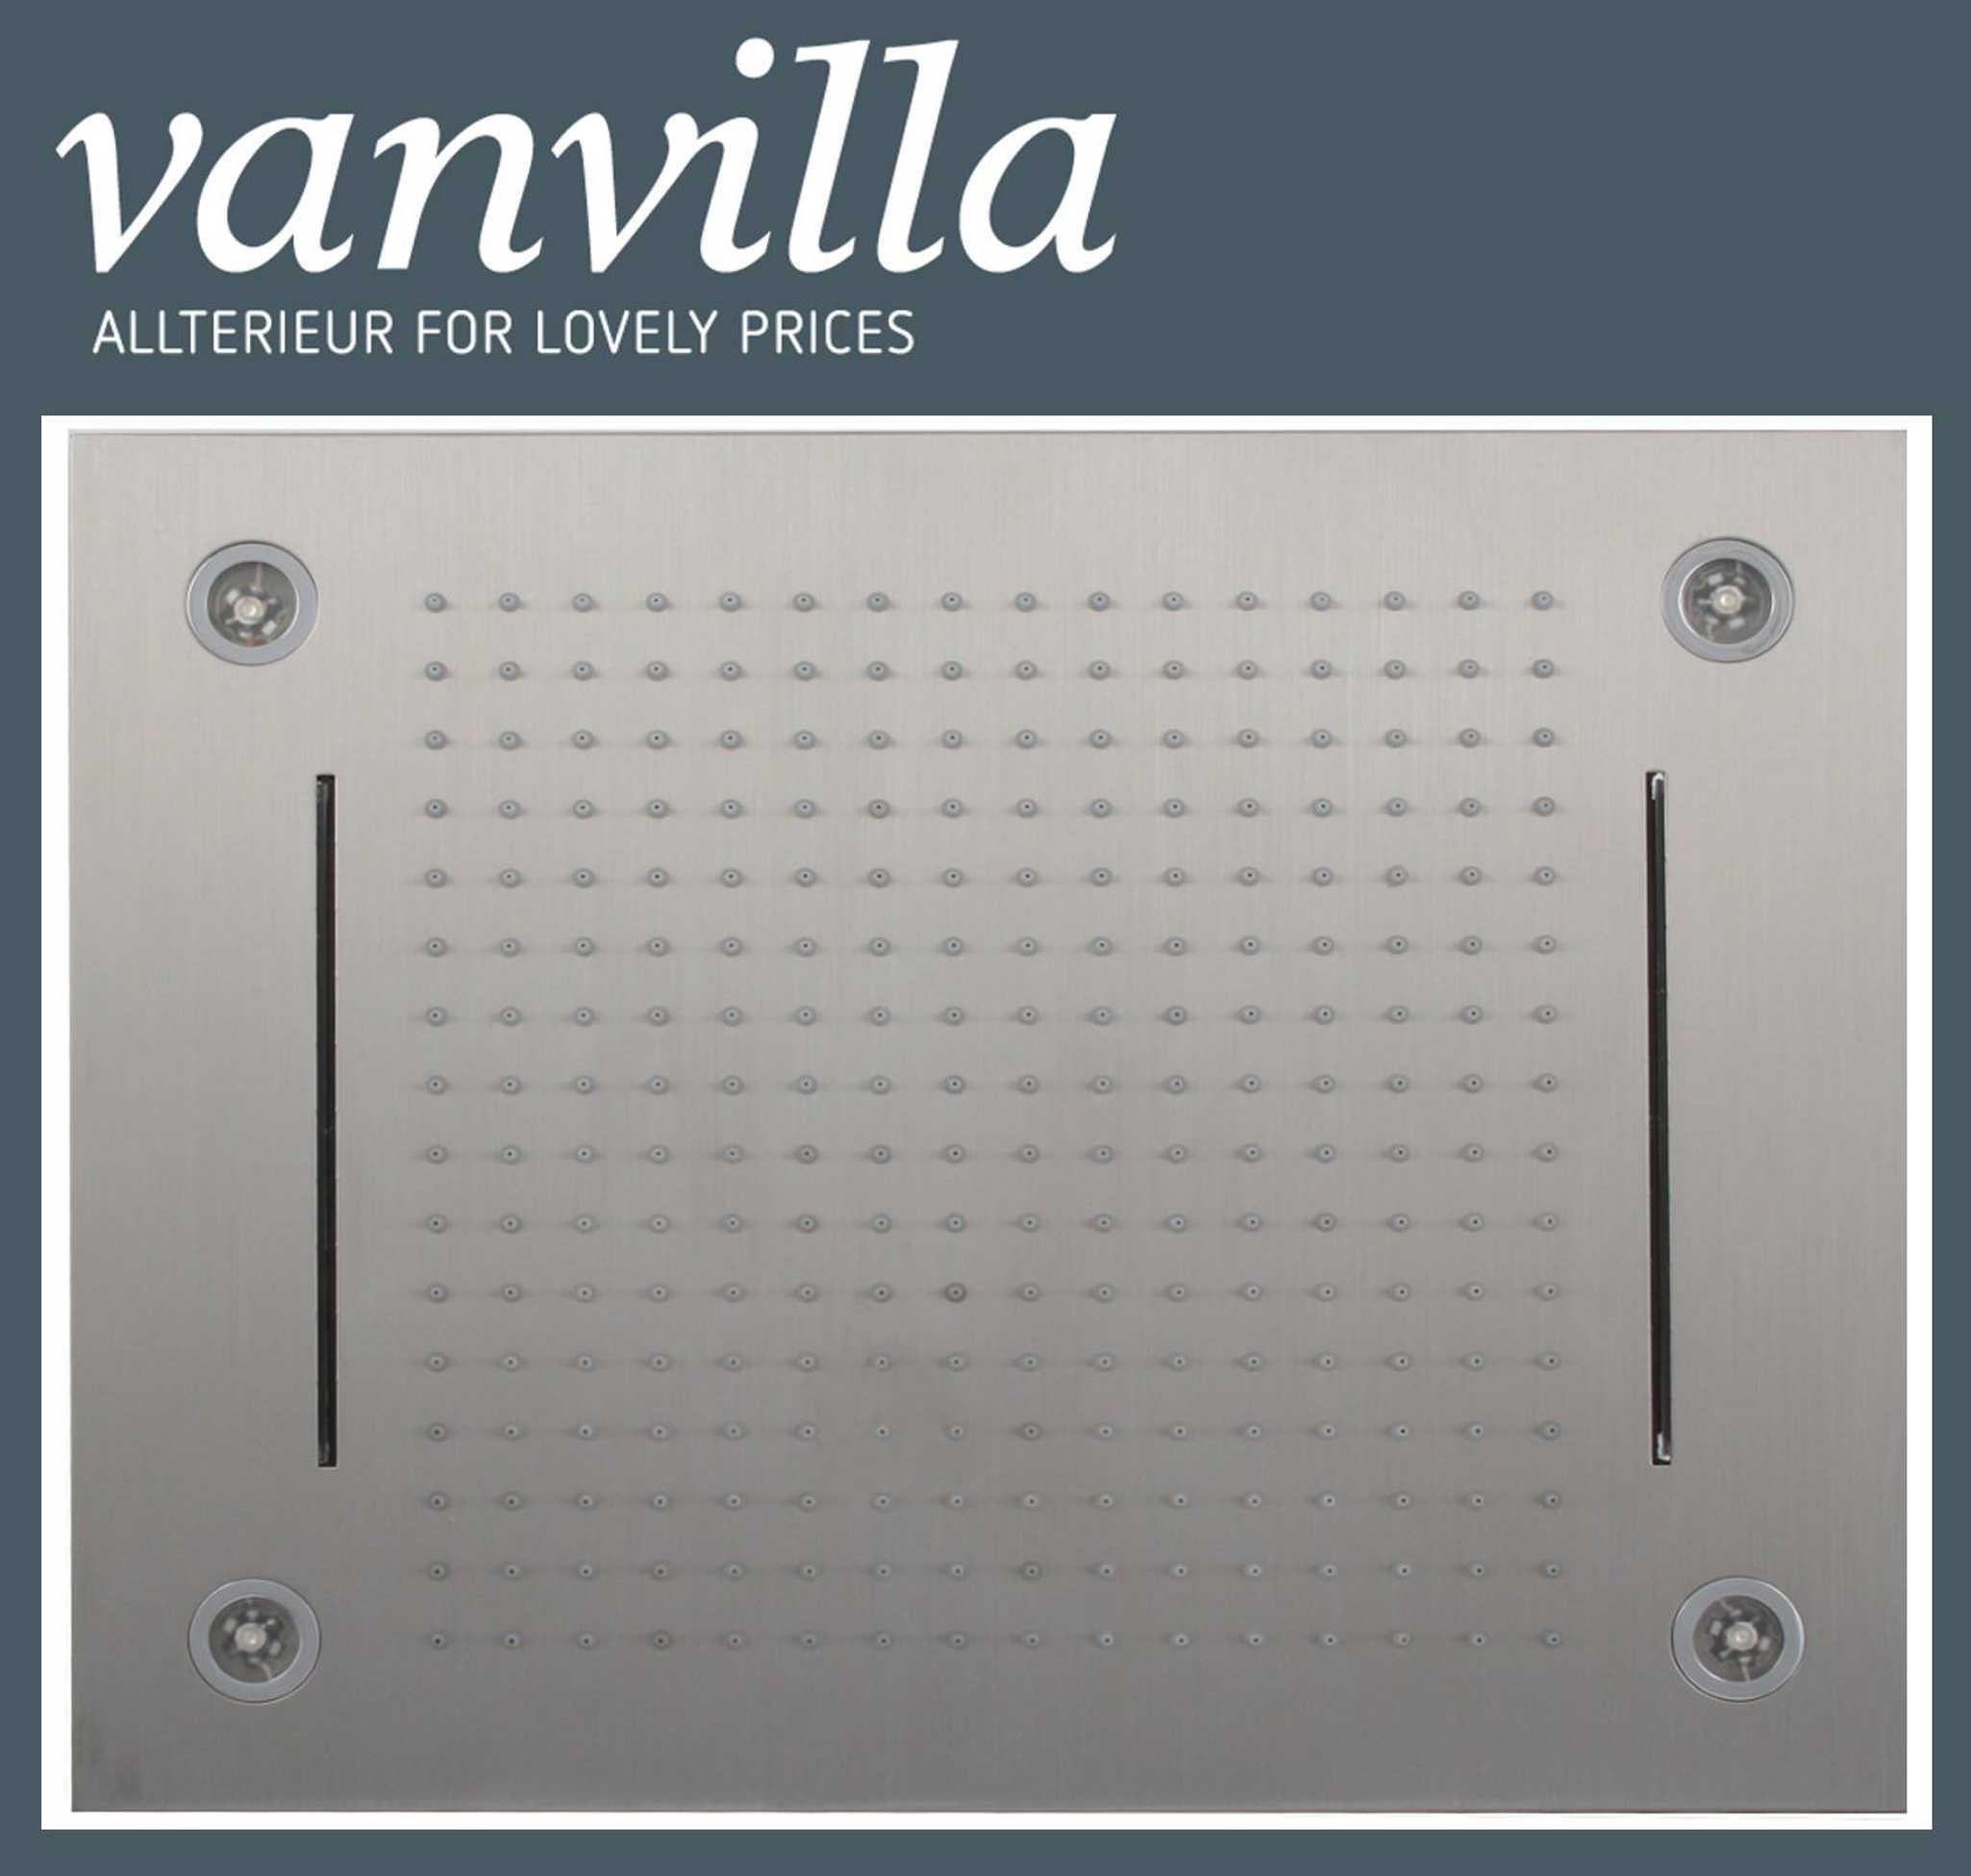 duschkopf vanvilla led 50cm x 40cm edelstahl geb rstet 8081 s 8134. Black Bedroom Furniture Sets. Home Design Ideas